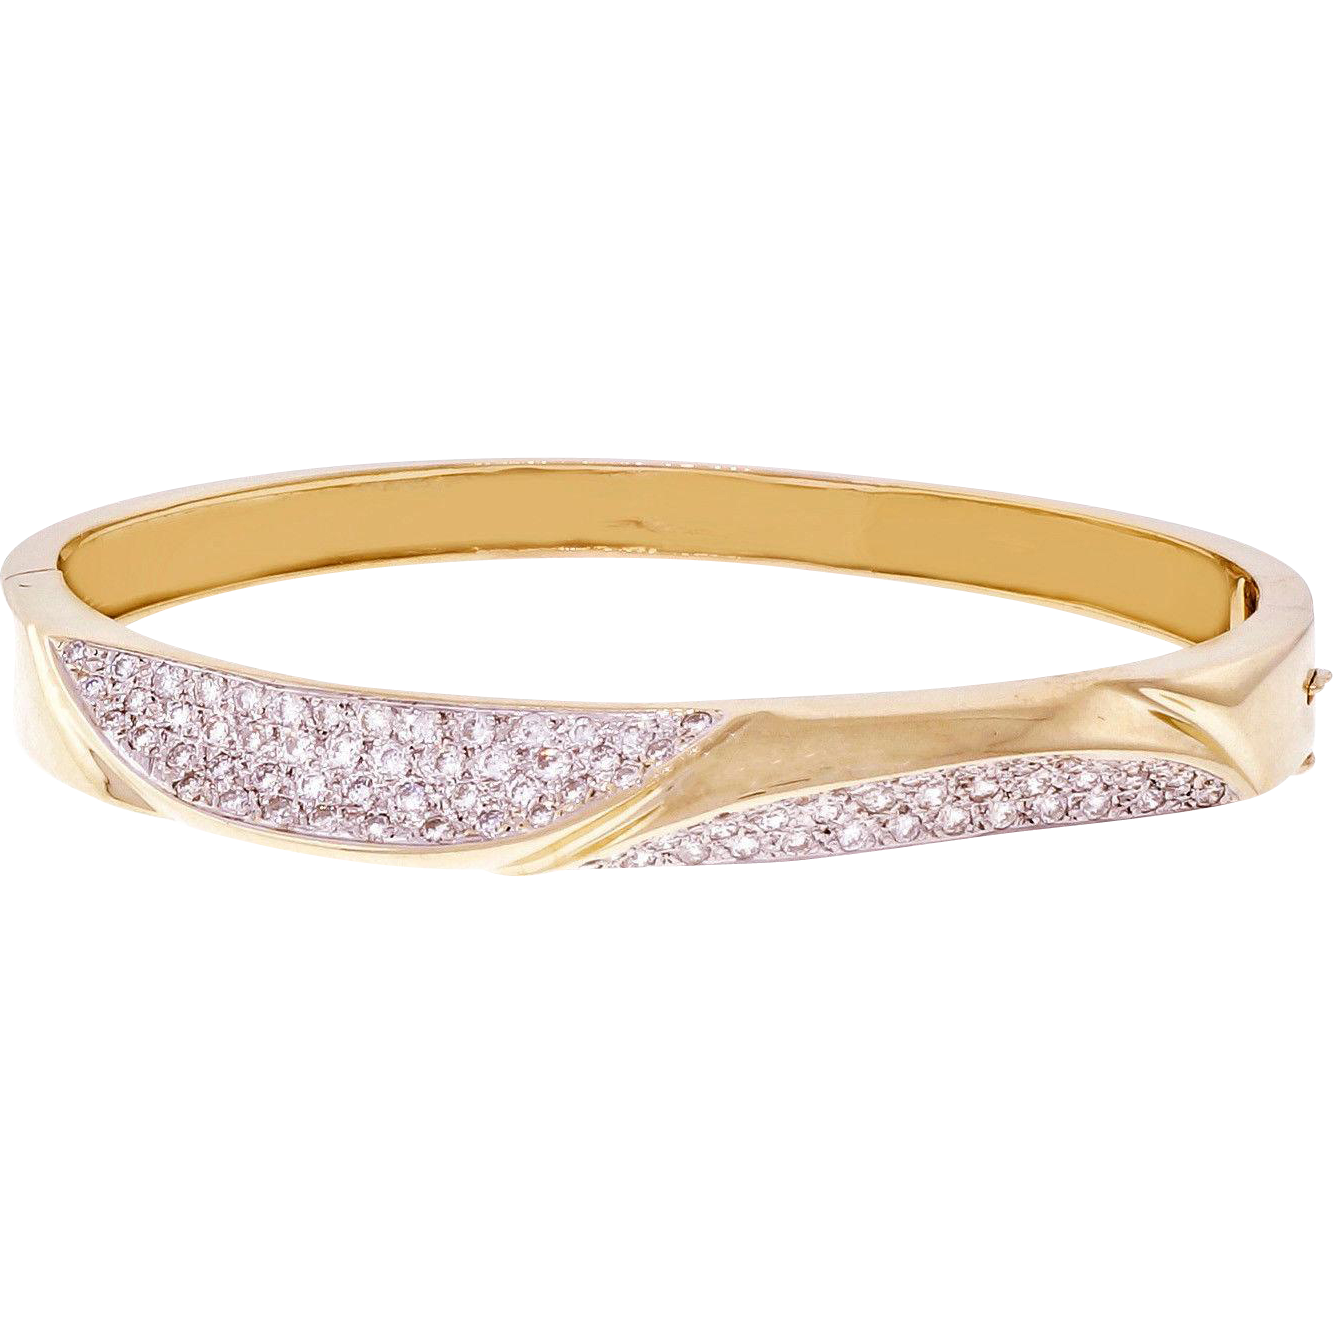 Pavé Diamond 14 Karat Yellow Gold Large Bangle Bracelet